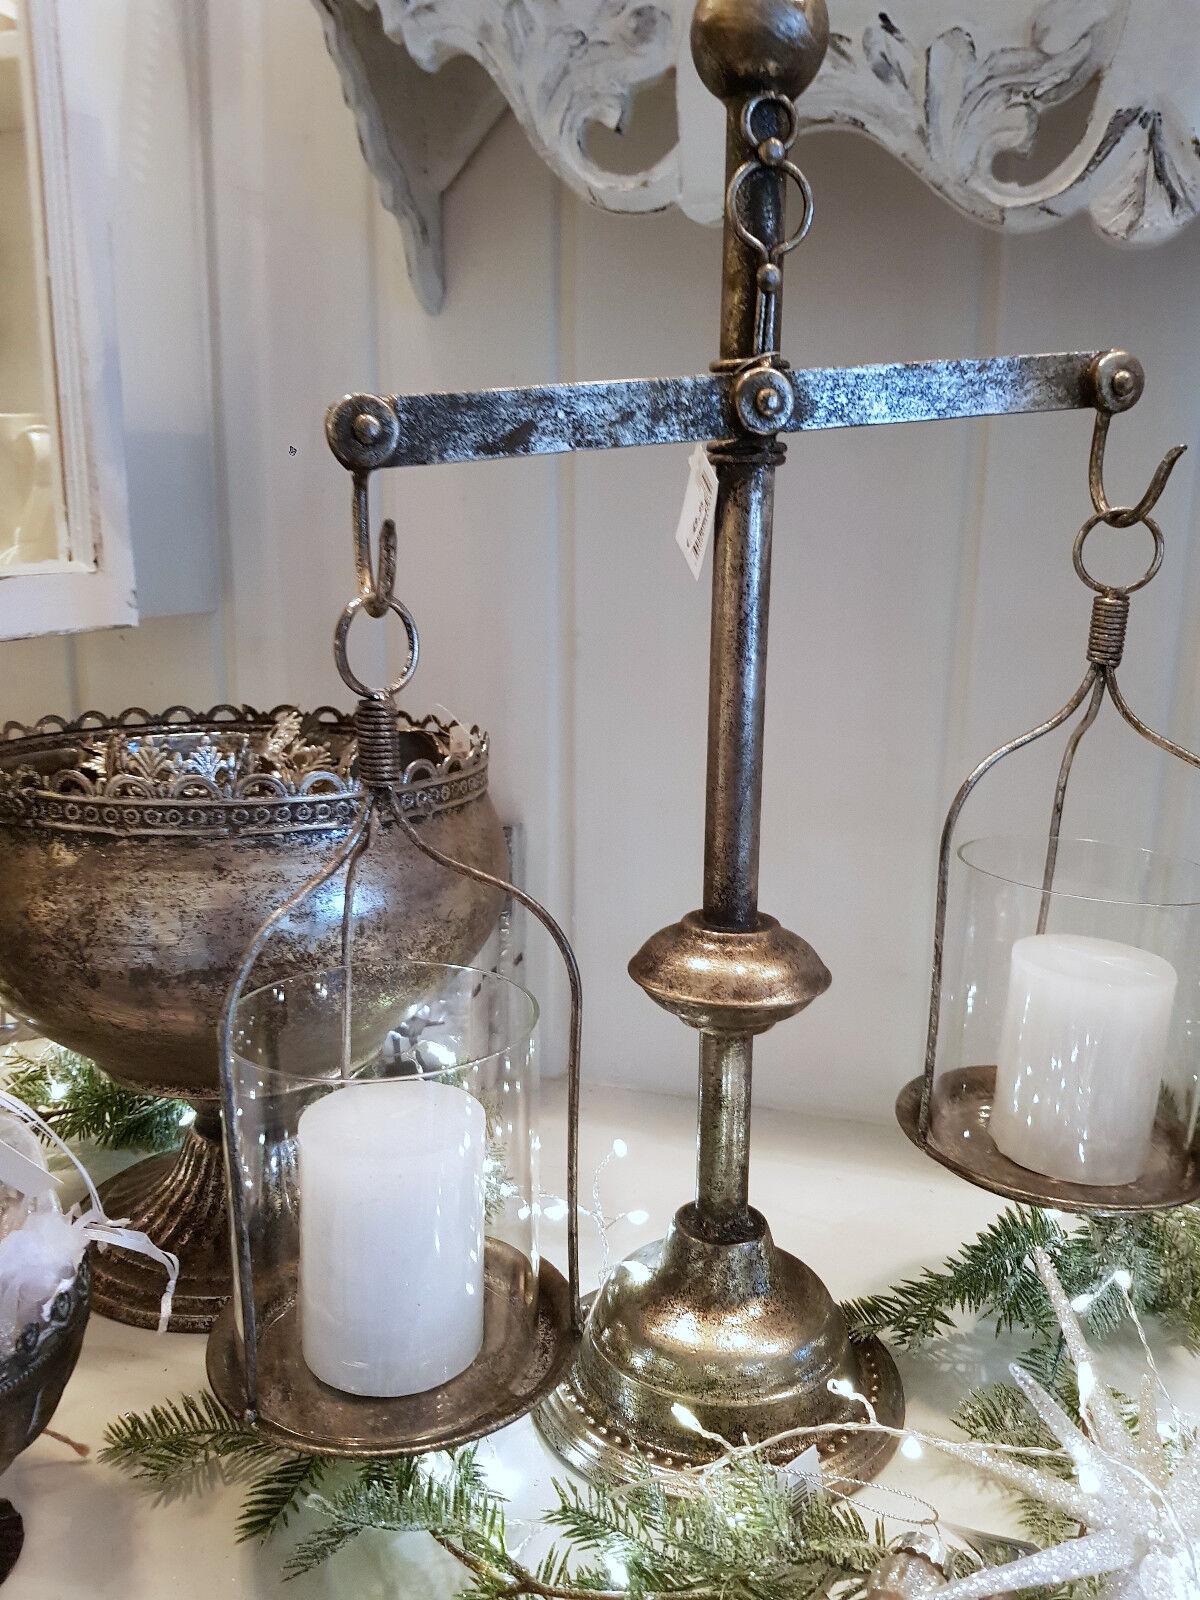 Windlicht Laterne Kerzenständer Metall Antiksilber Shabby Vintage Landhaus Landhaus Landhaus Deko fdc2ab